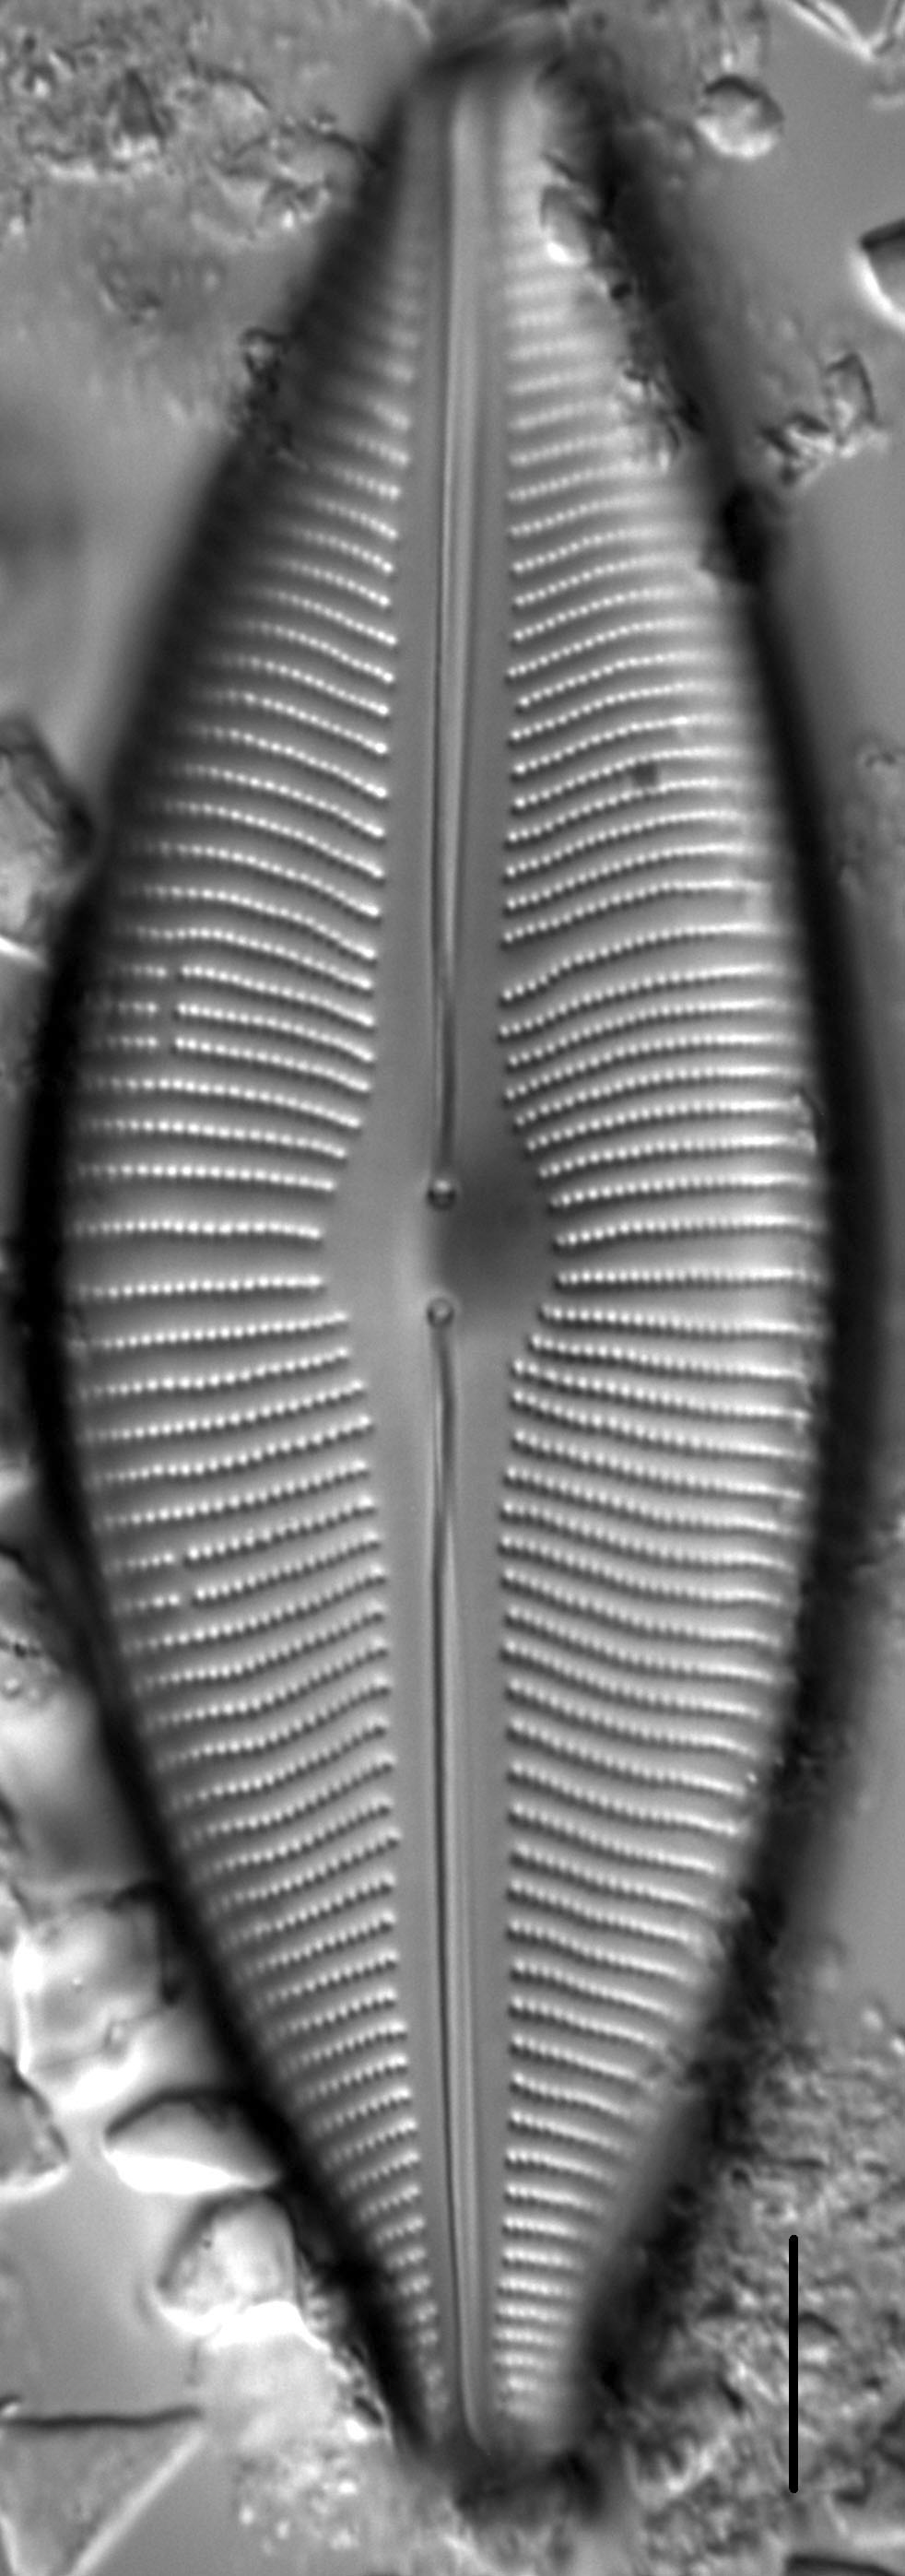 Cymboinaequalis4